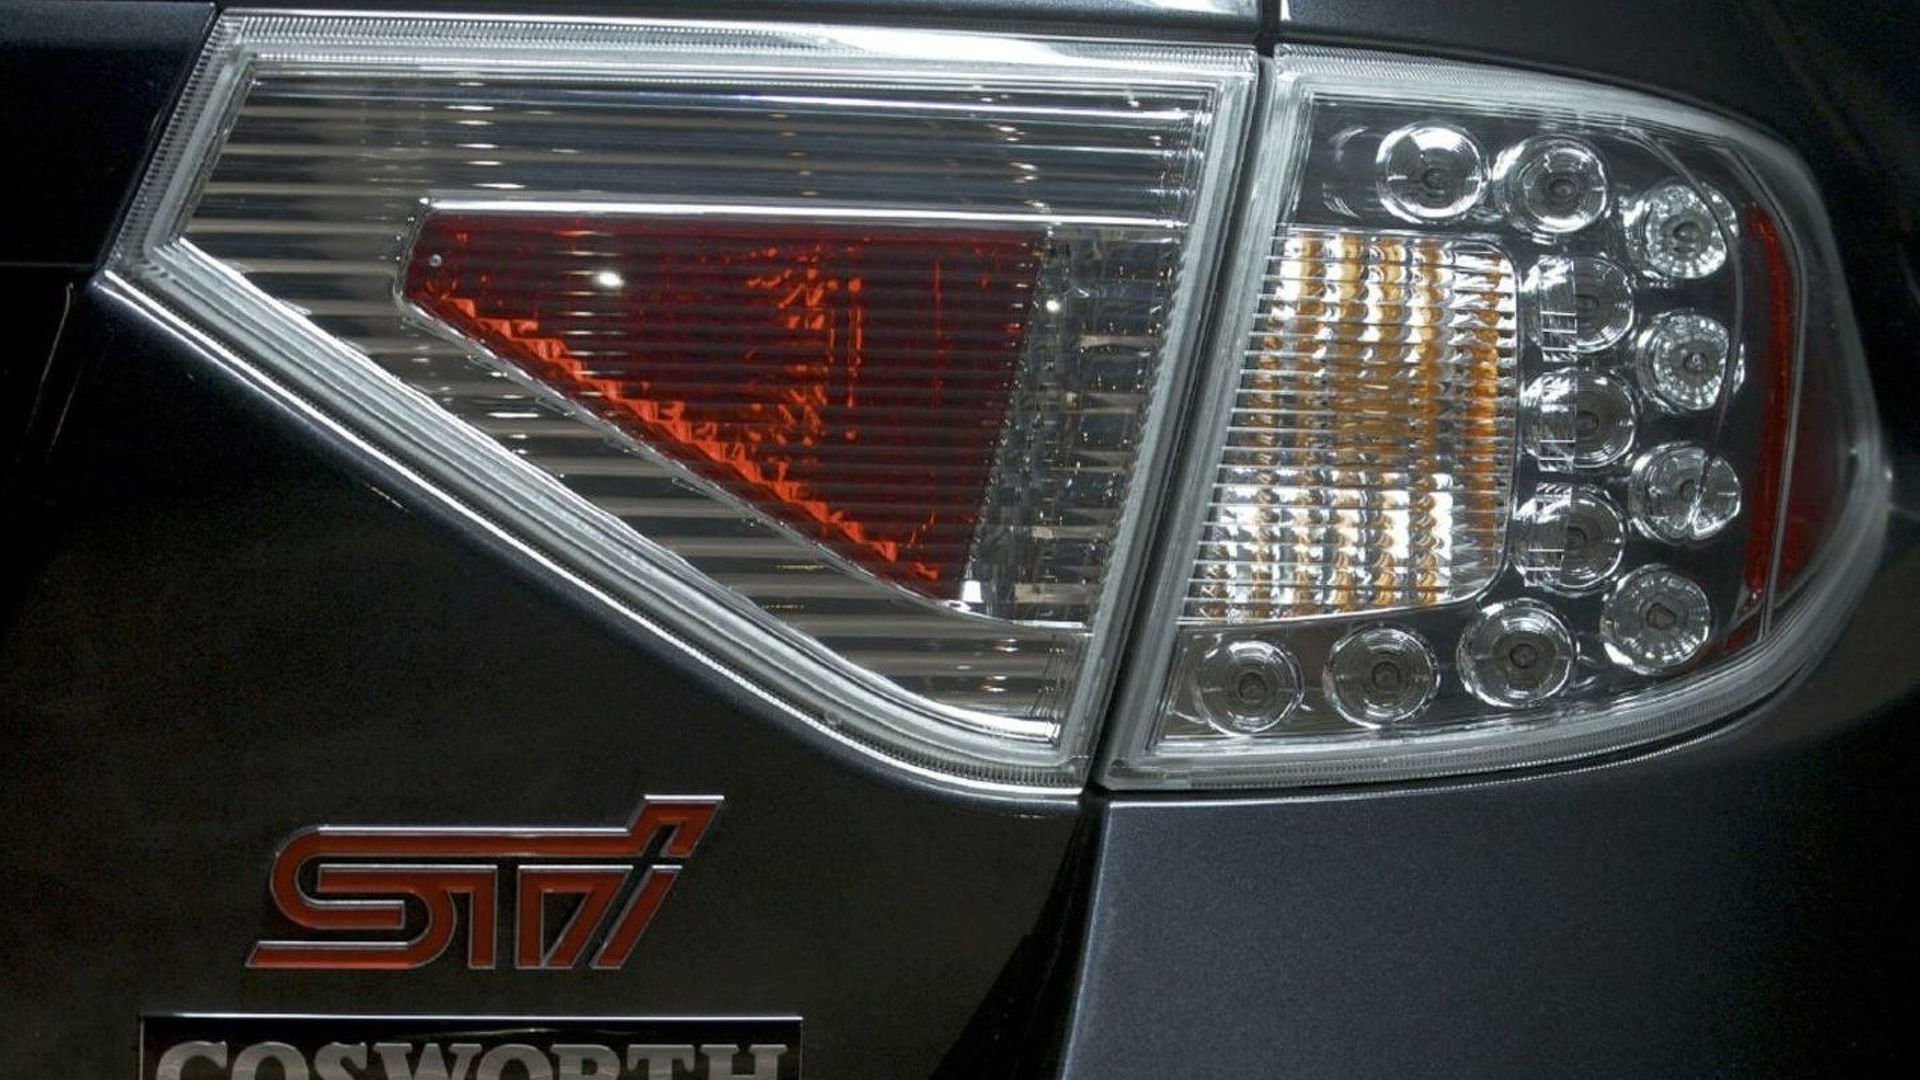 Cosworth Tuned Subaru Impreza STI to Debut in Geneva - 500+hp rumored